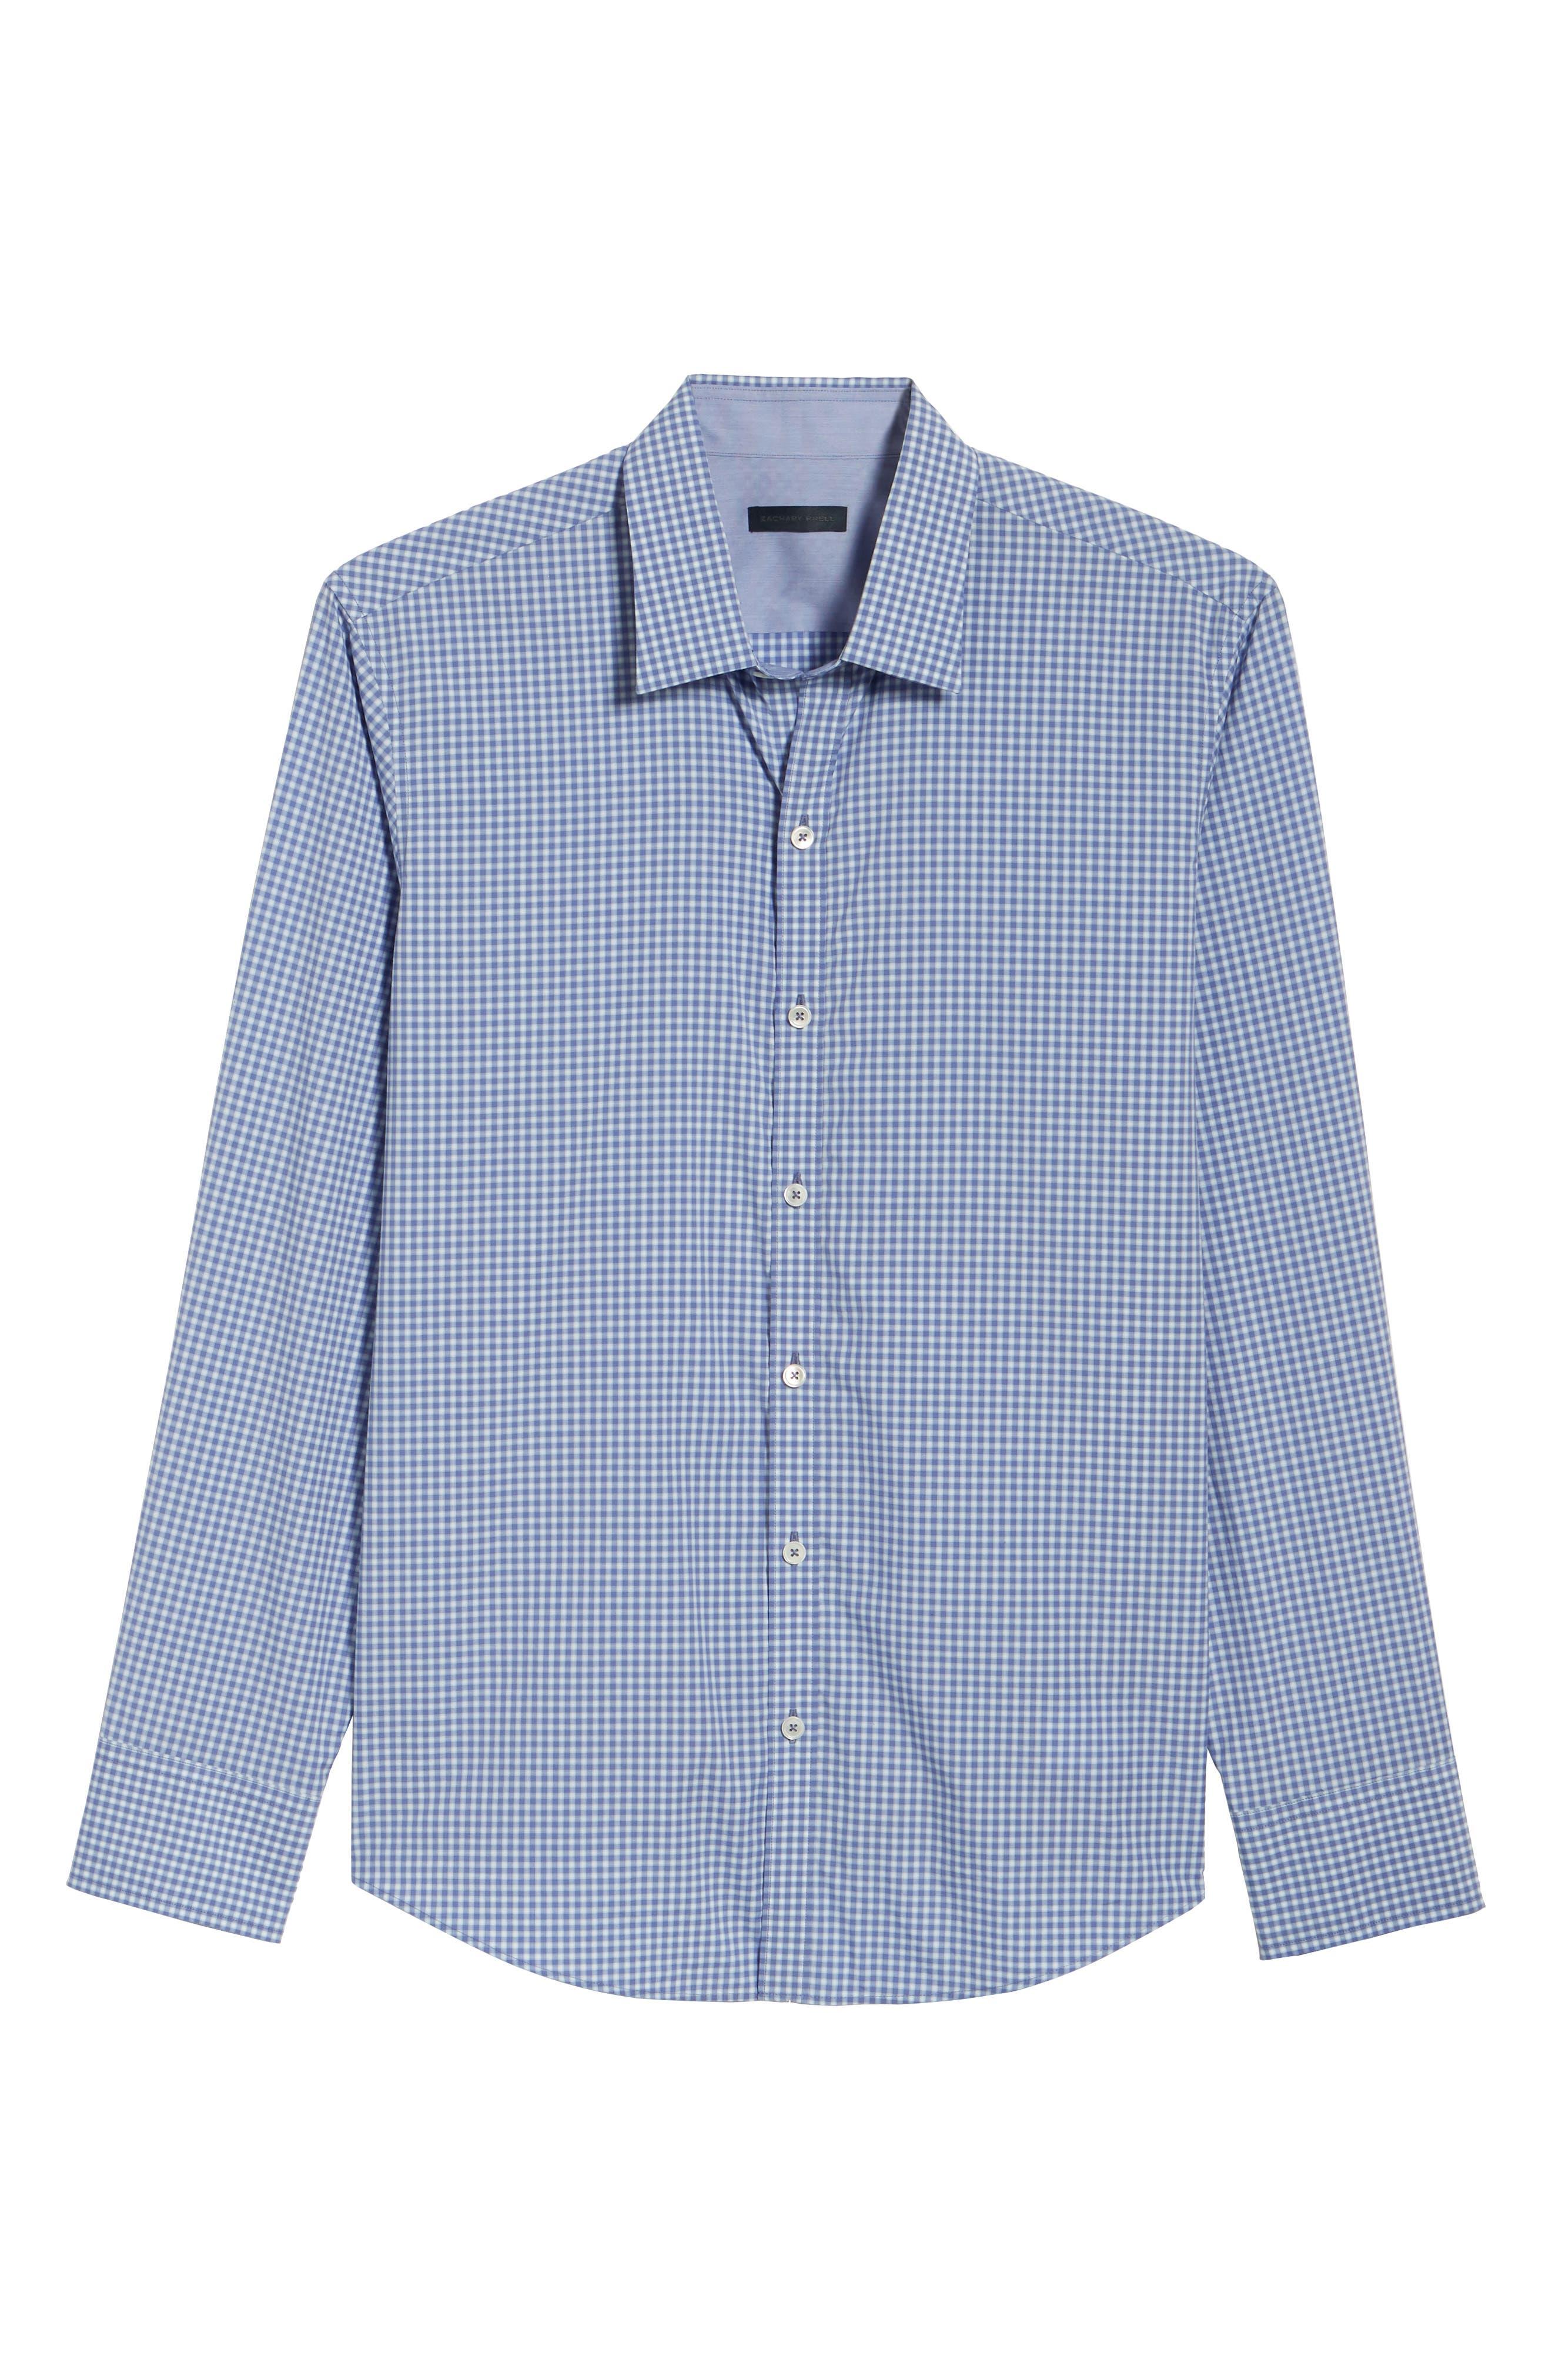 Winston Regular Fit Sport Shirt,                             Alternate thumbnail 6, color,                             Ocean